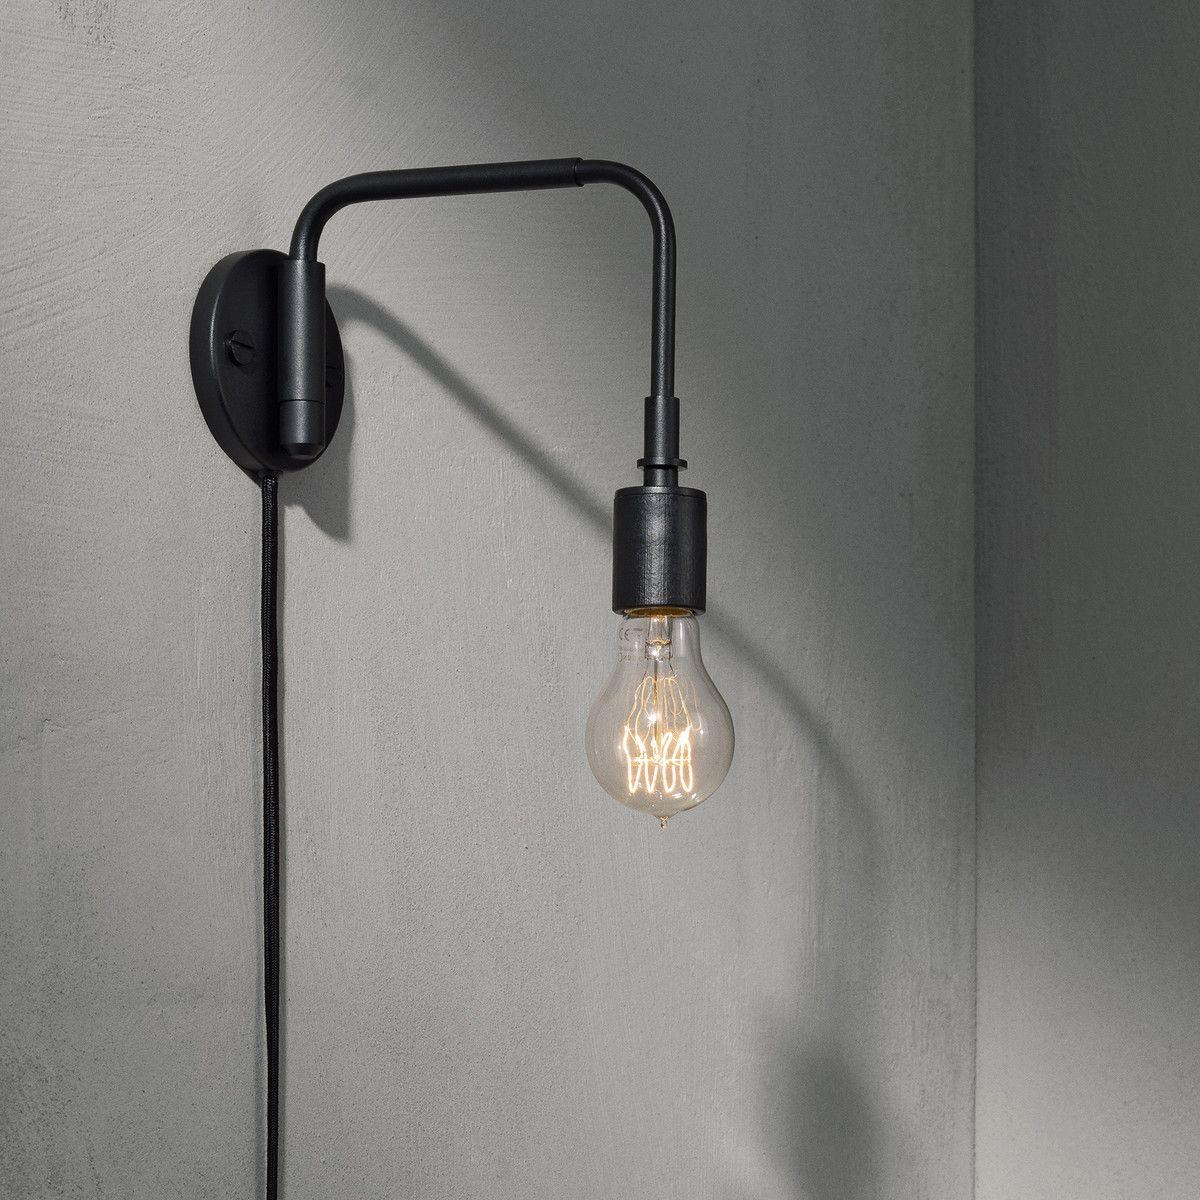 Staple Wandleuchte Von Menu Im Shop Wandleuchte Lampe Wand Wandlampe